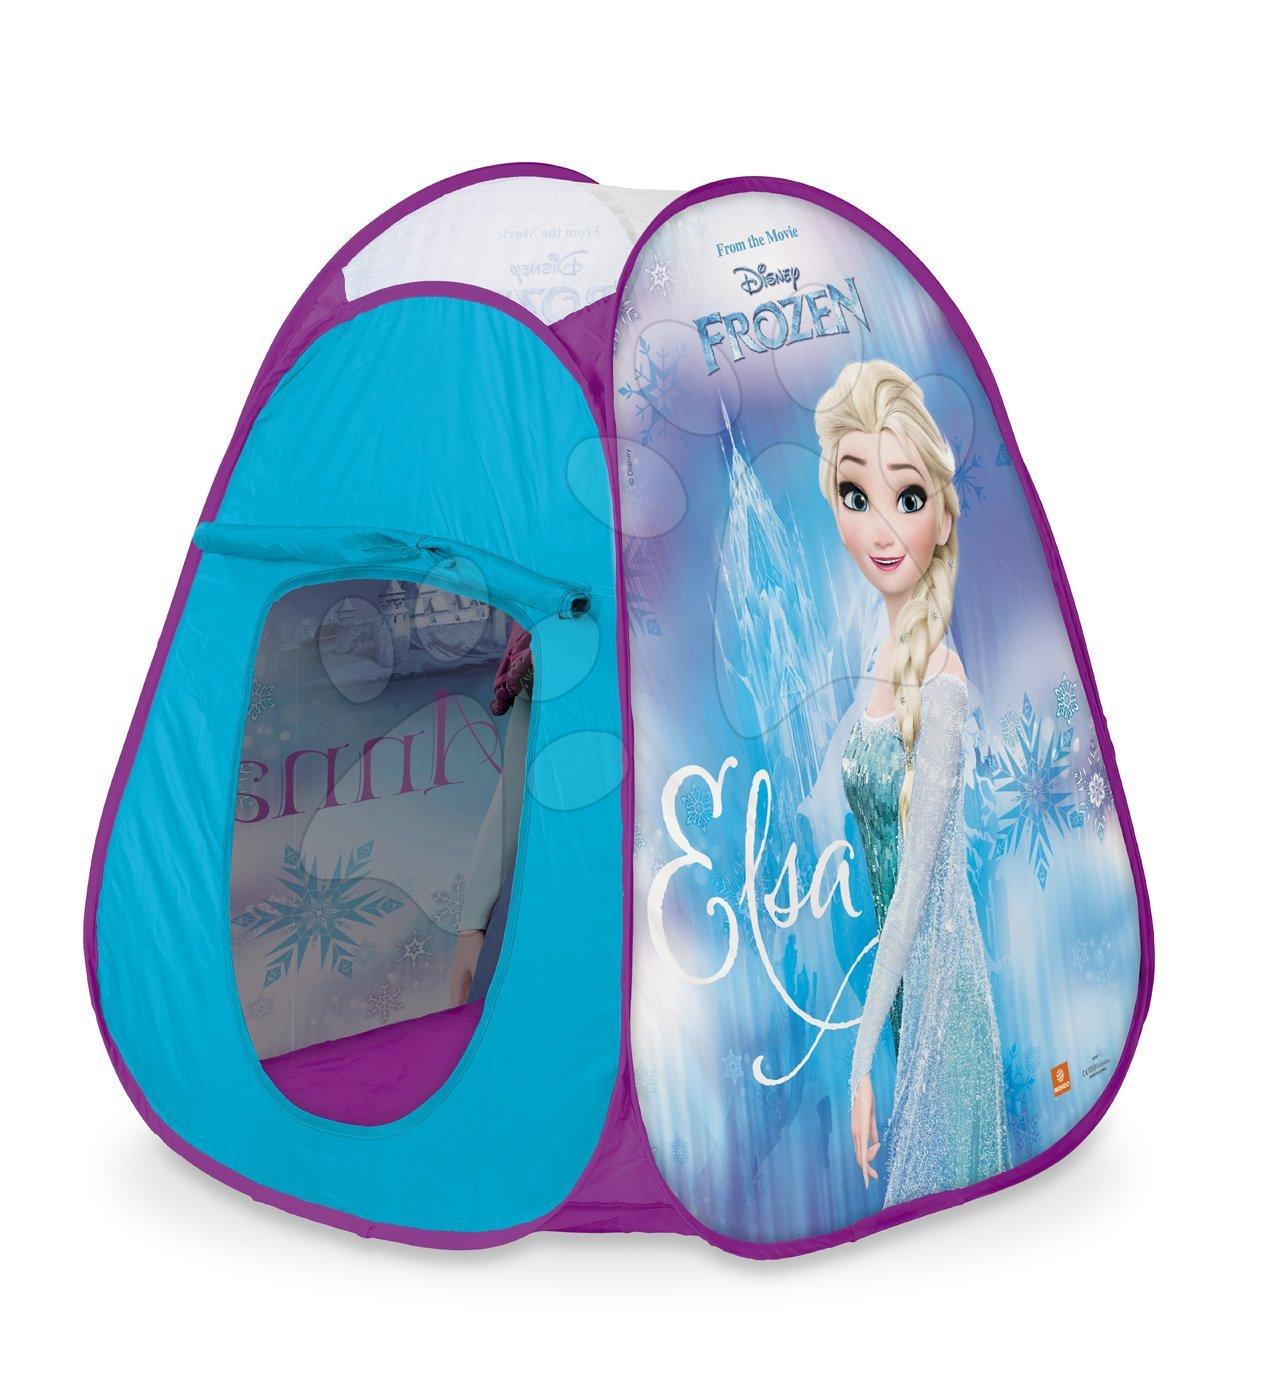 Mondo stan pre deti Frozen Pop Up s fialovou okrúhlou taškou 28391